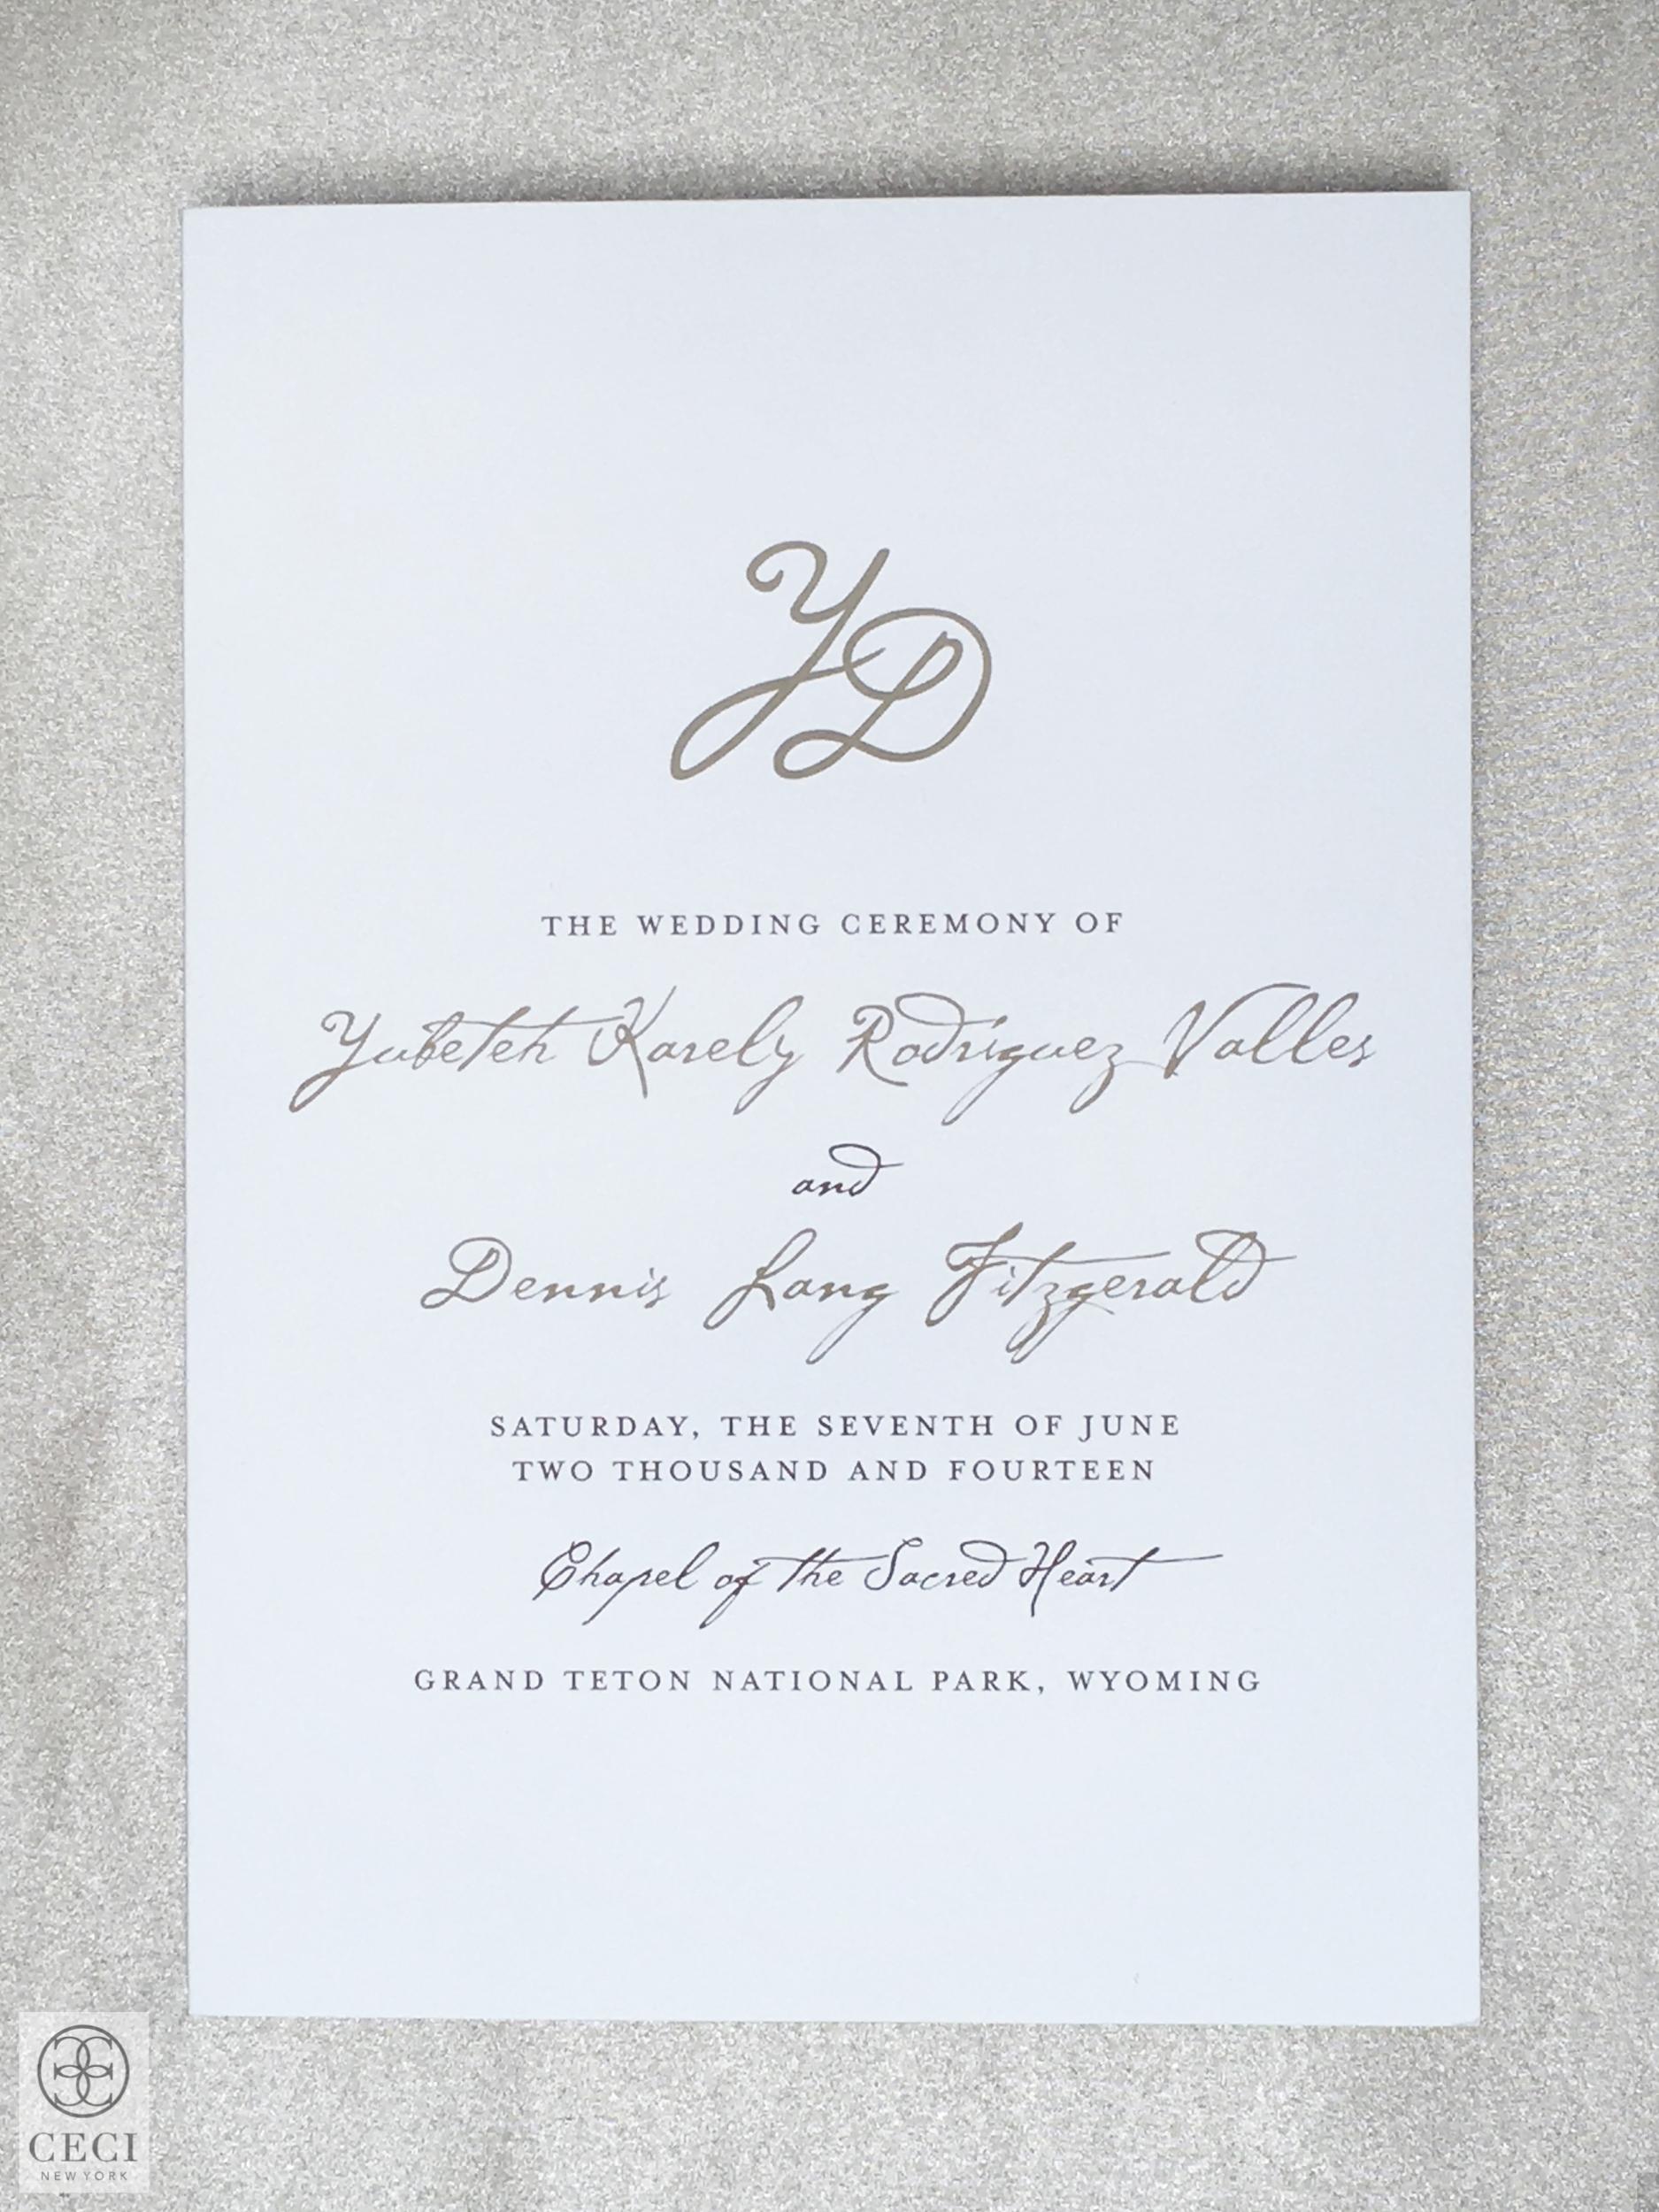 Ceci_New_York_Lyndsey_Hamilton_Events_Invitations_Wedding_Amangani_Elegance_Gold_Foil_Letterpress_Classic_Stamping_Custom_Couture_Personalized-19.jpg